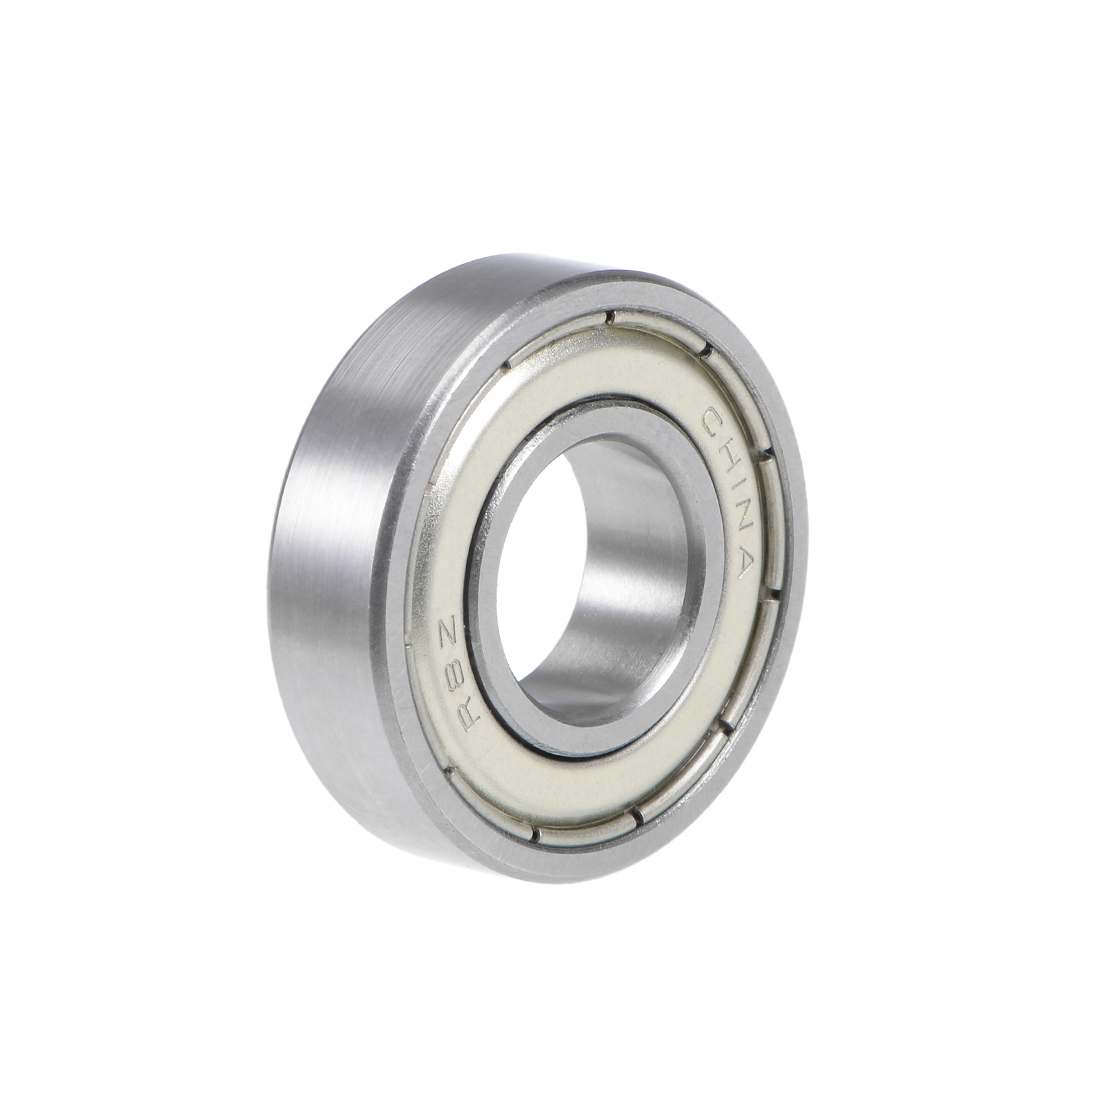 "R8ZZ Deep Groove Ball Bearing 1/2""x1-1/8""x5/16"" Shielded Chrome P6Z2 Bearings"